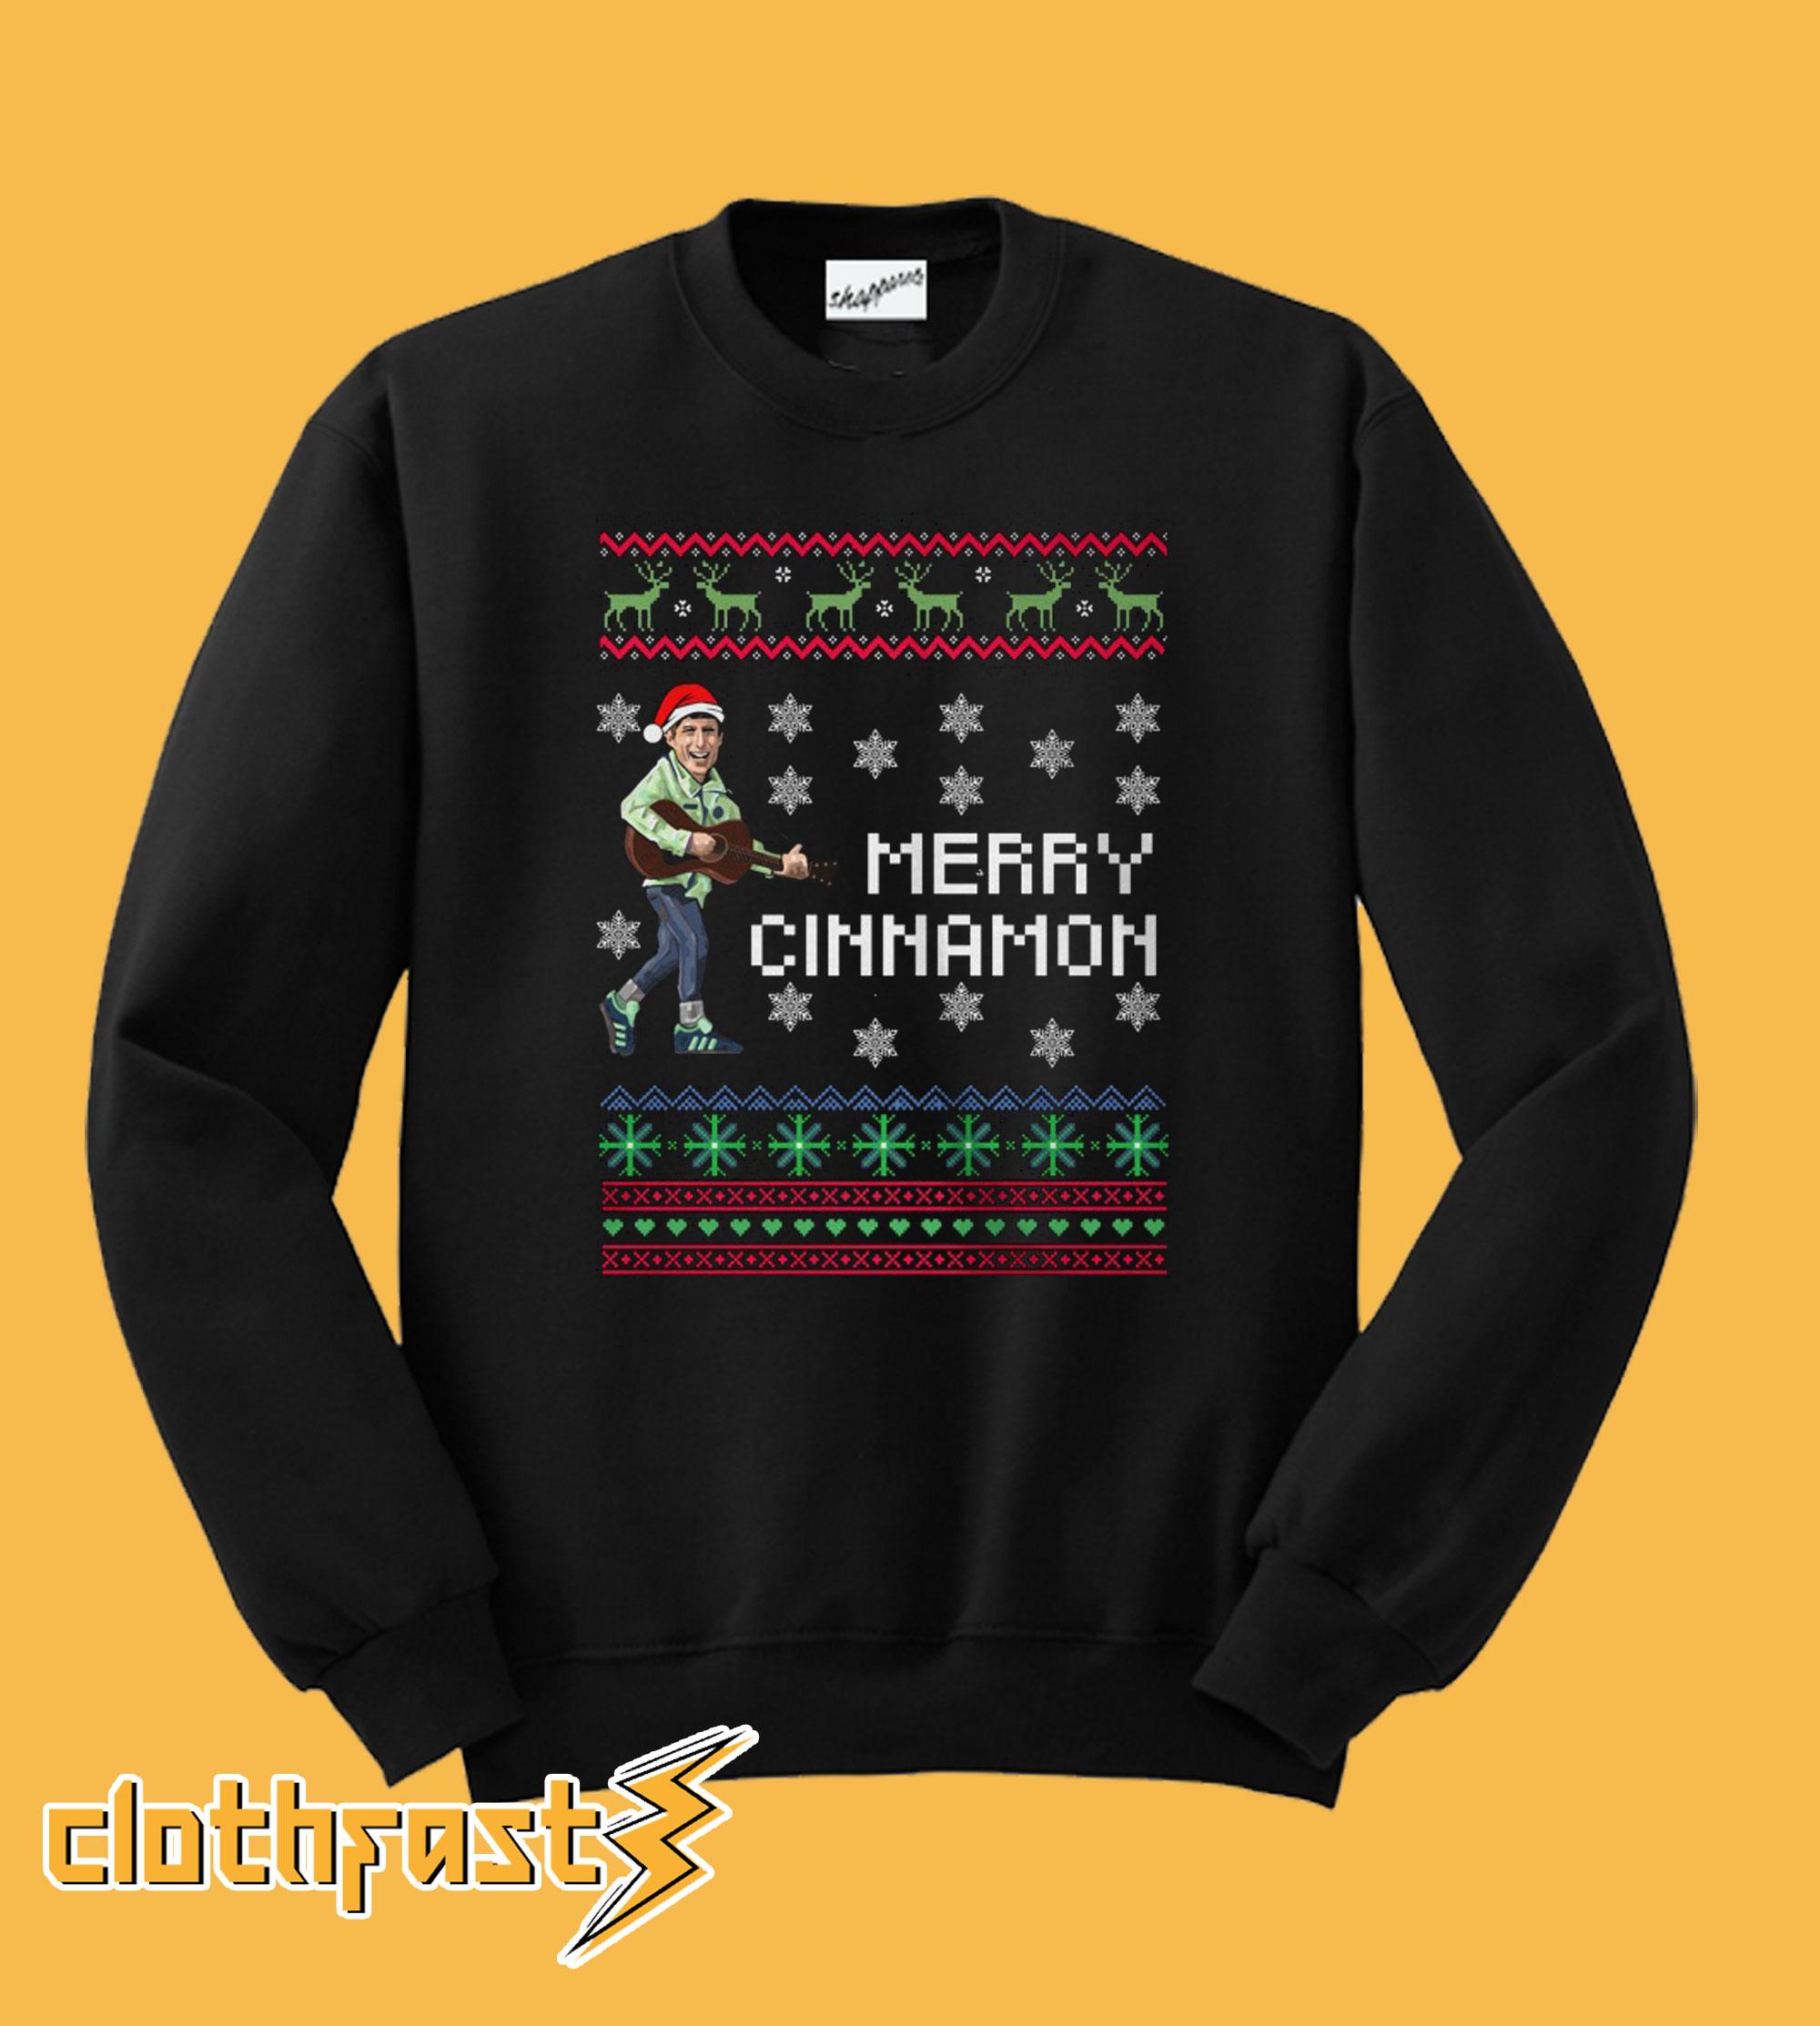 Gerry Cinnamon Merry Cinnamon Christmas Sweatshirt